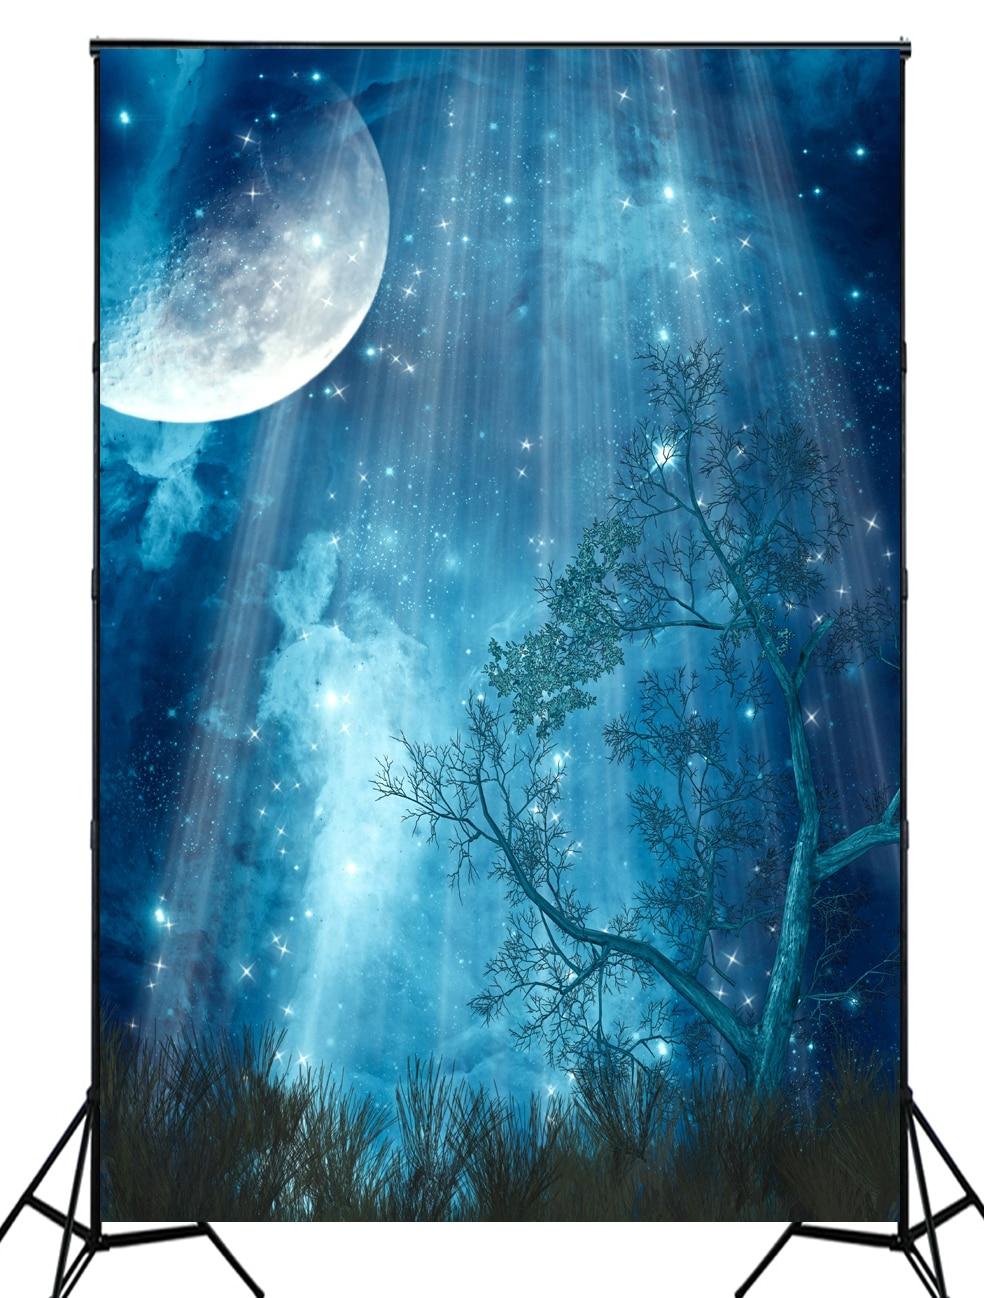 HUAYI Big Noche De Luna fotografía calabaza Halloween telón de fondo XT4232